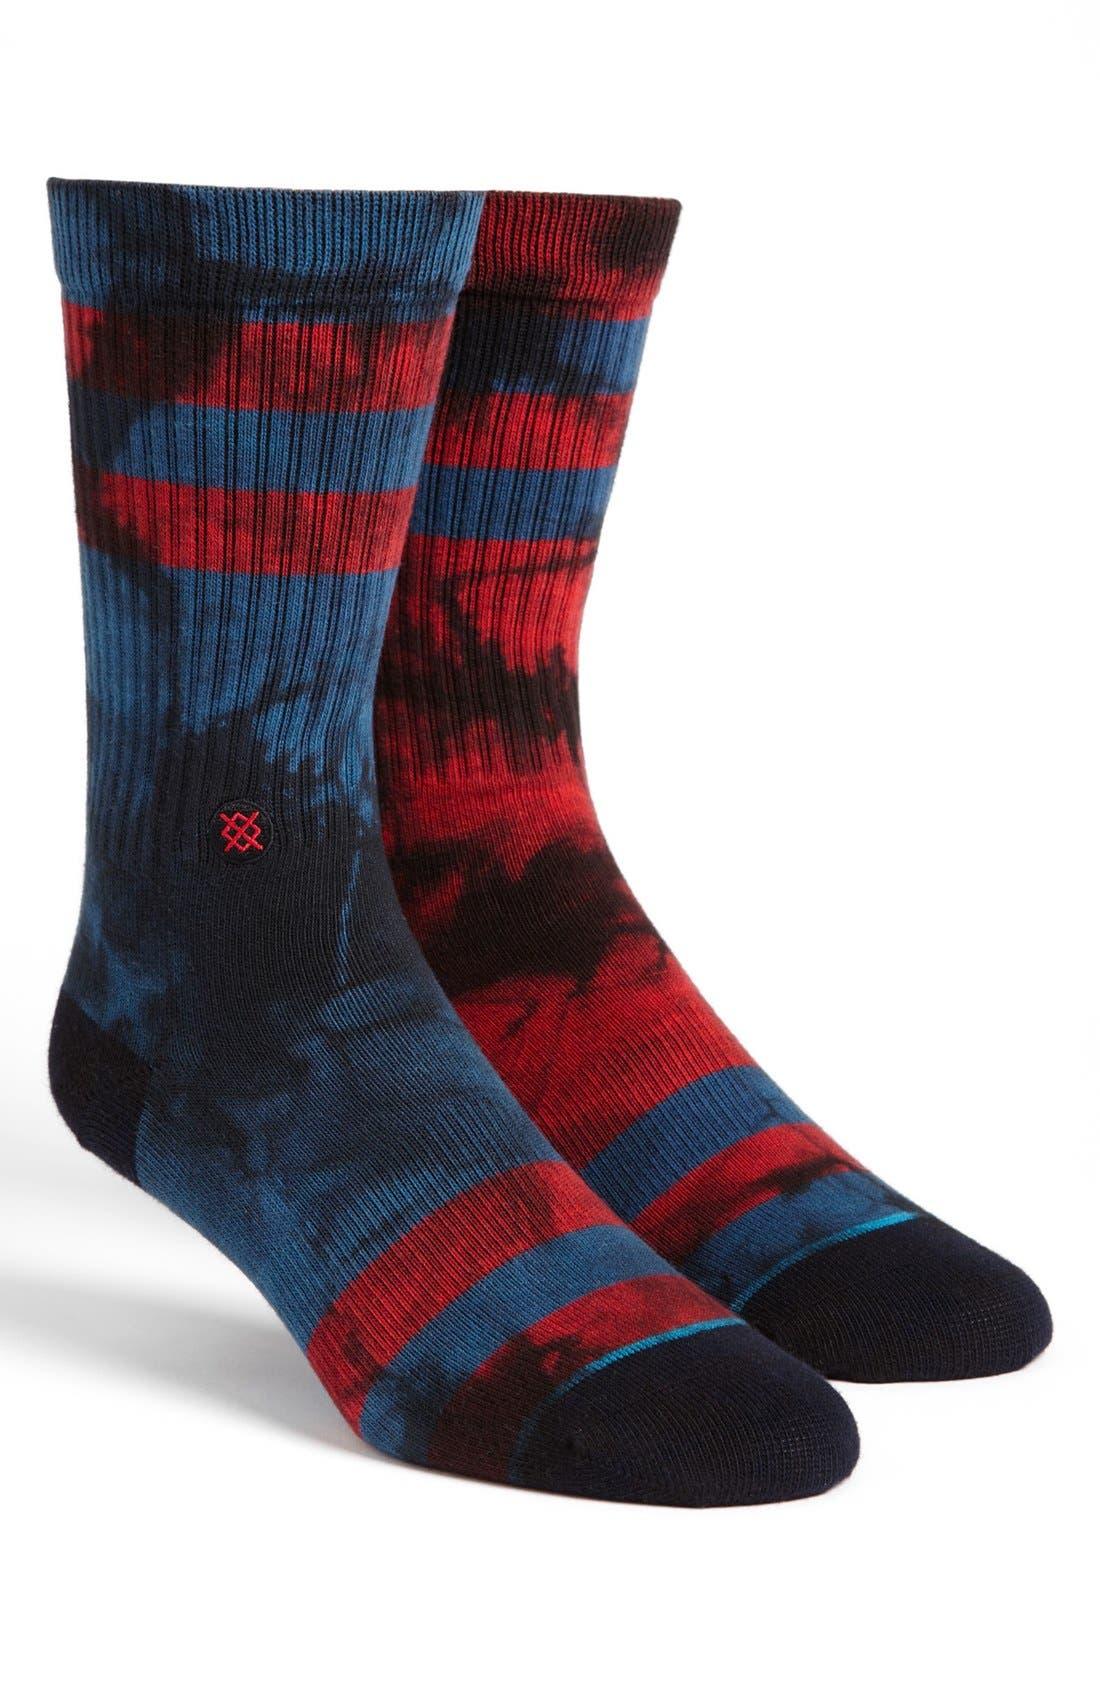 Main Image - Stance 'Invert' Rib Crew Socks